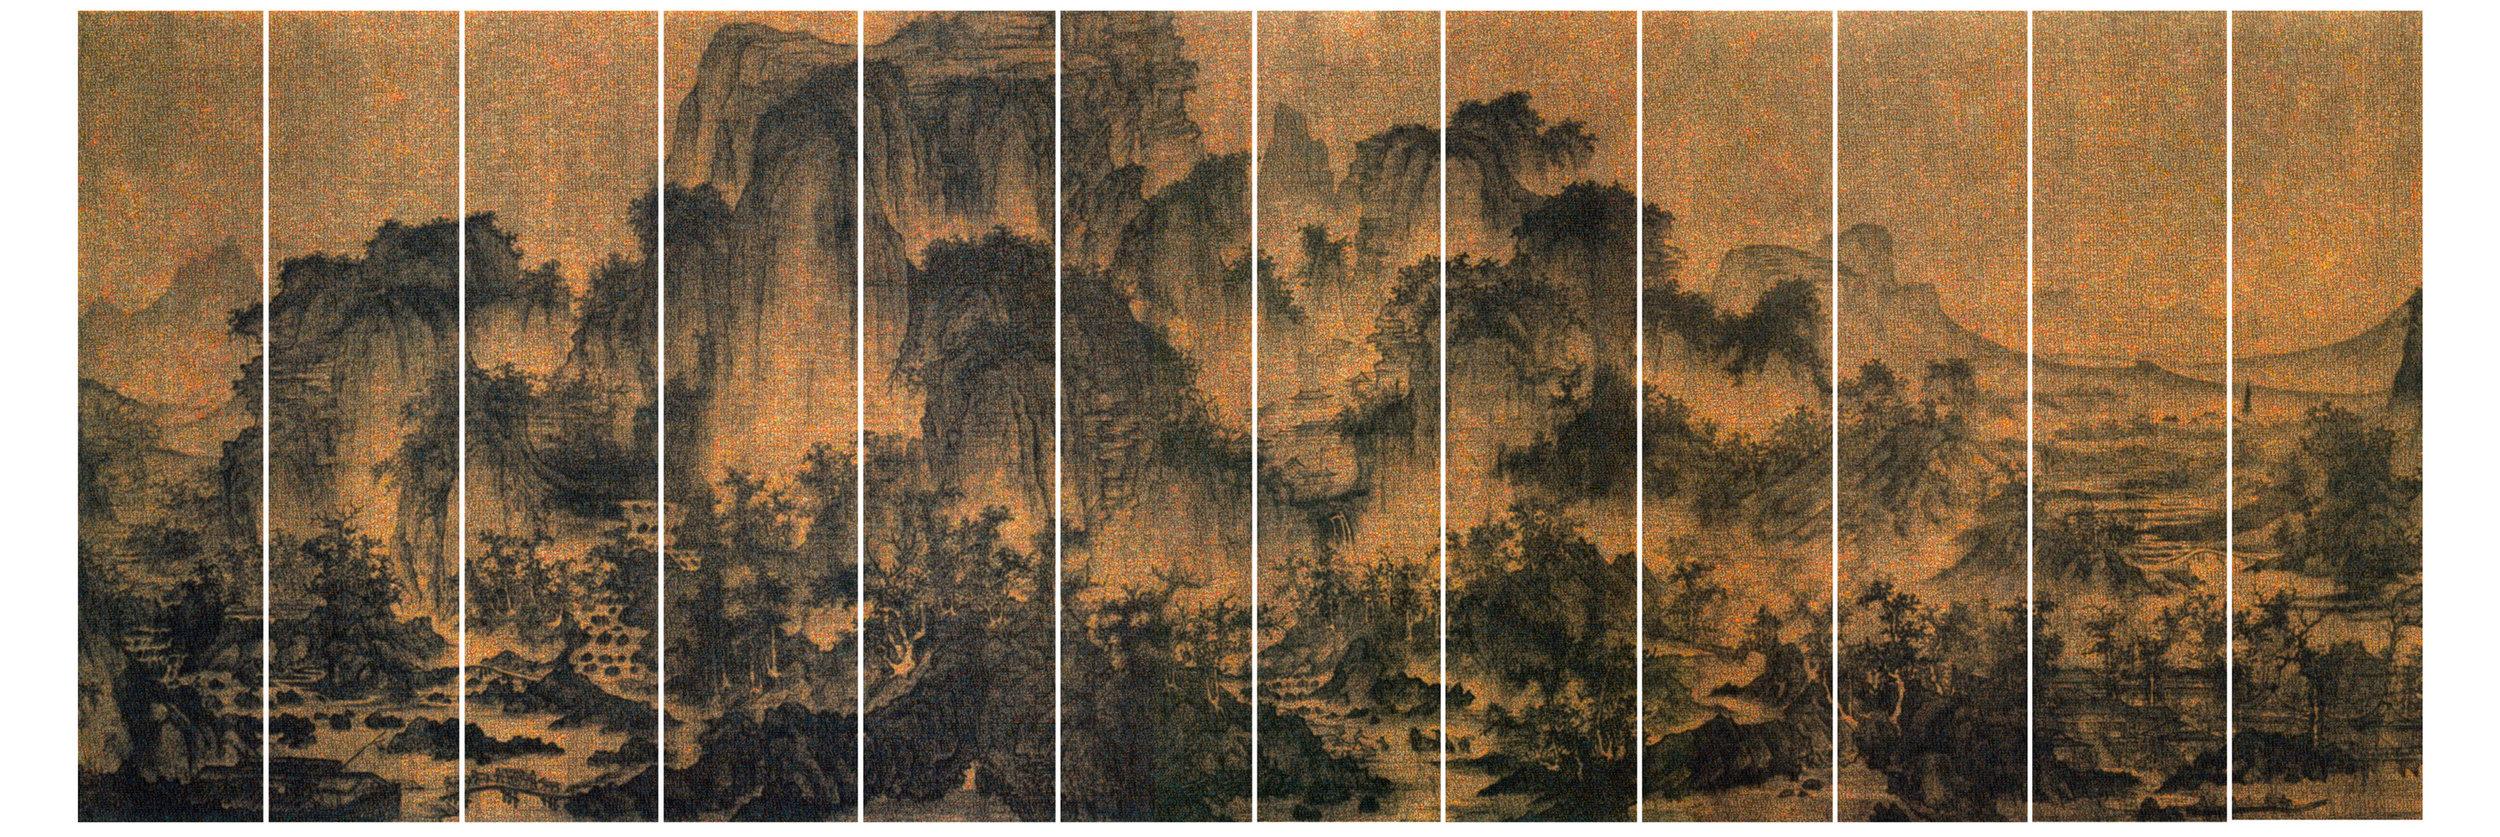 GUO JIAN   The Landscape No.3  2016 Inkjet pigment print ( 12 panels) 200 cm x 564 cm